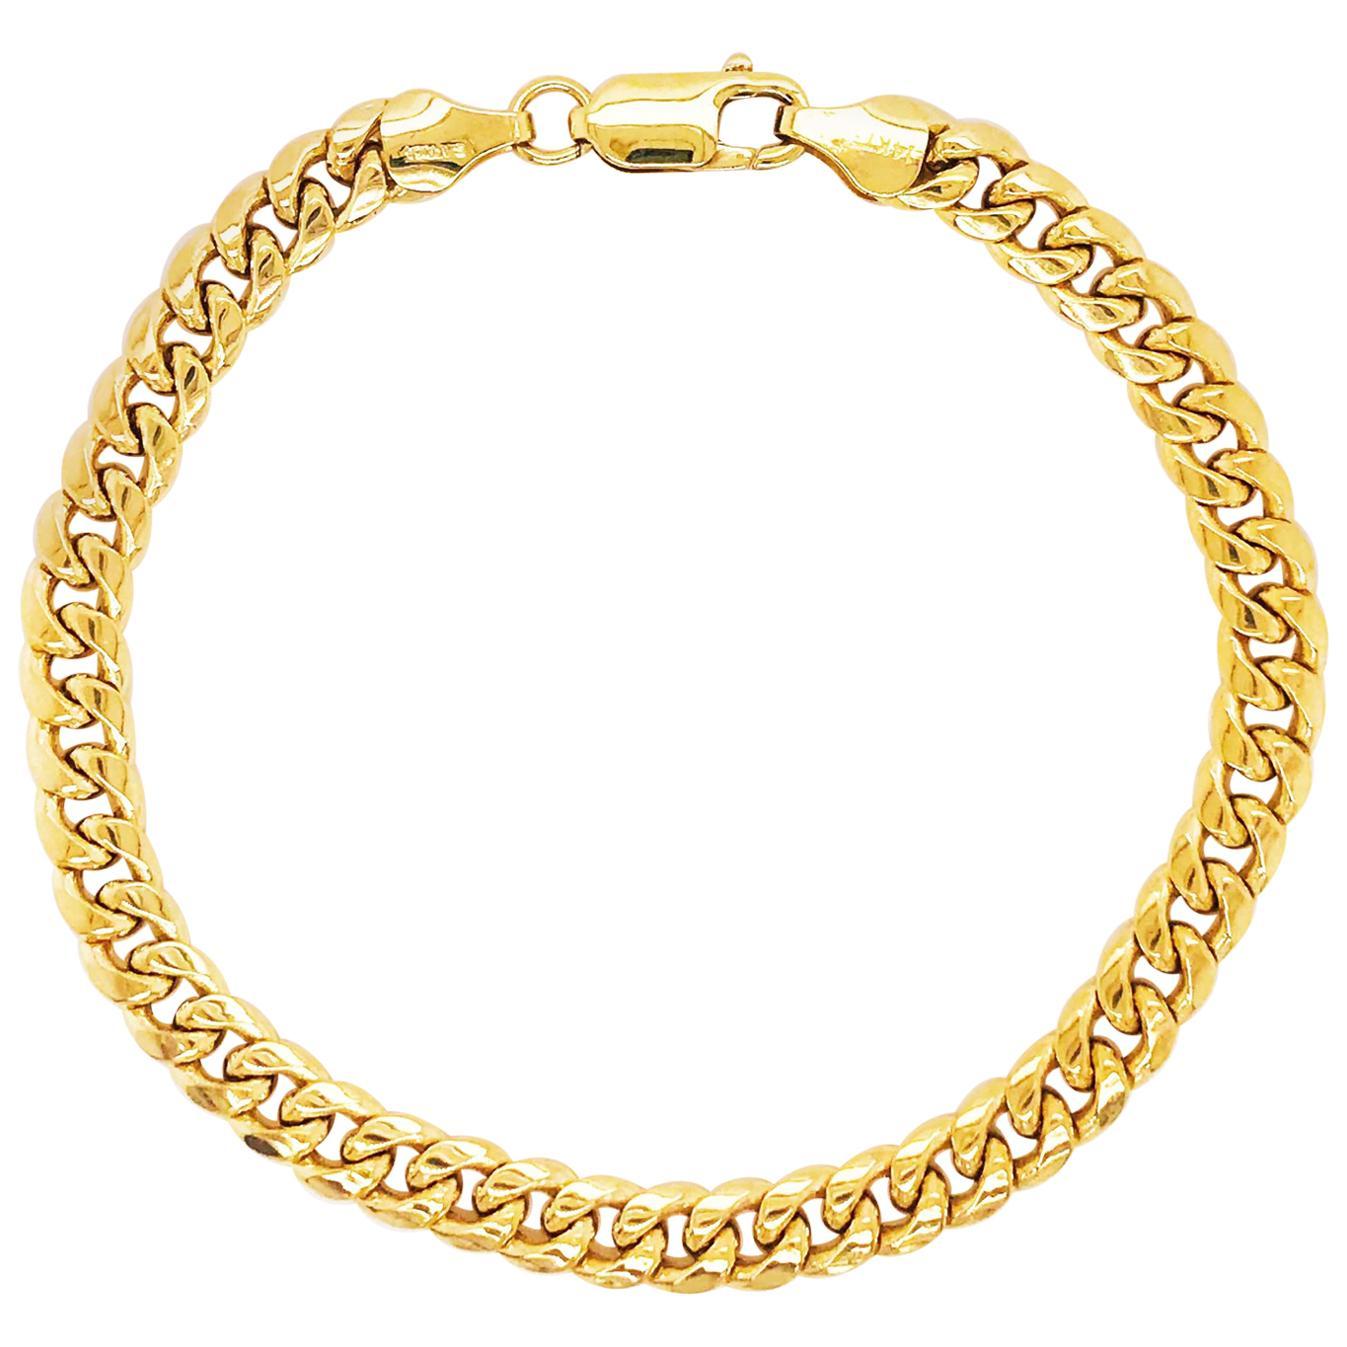 Miami Cuban Chain Bracelet 14 Karat Yellow Gold Men's and Women's Chain Bracelet